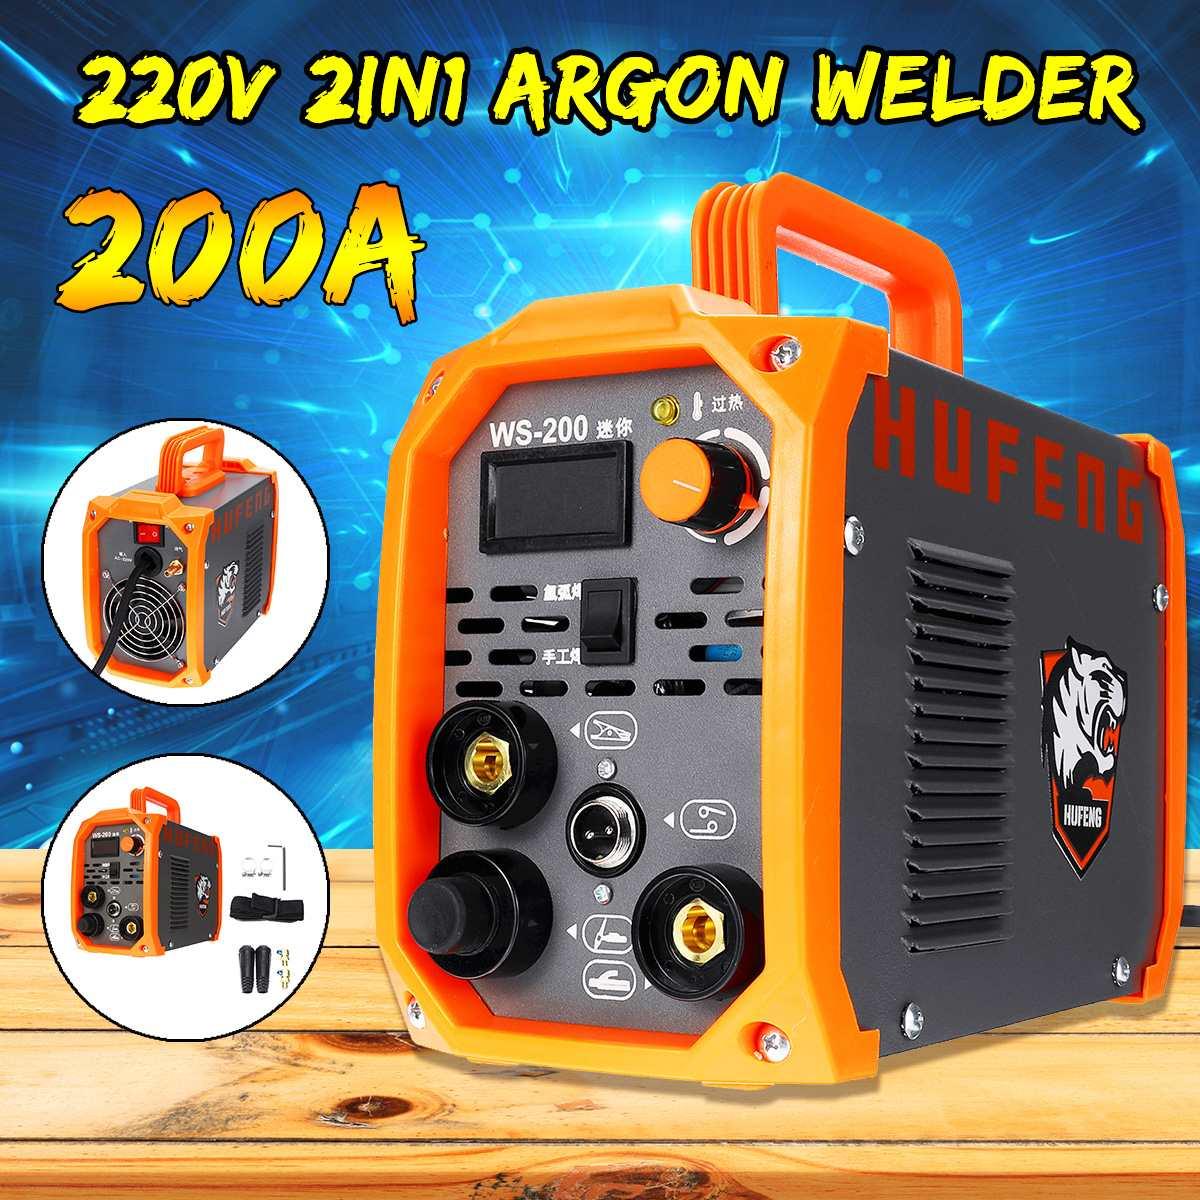 2IN1 200A Handheld Mini MMA IGBT Inverter 220V Portable Mini Electric ARC Welding TIG/STICK Argon Welder Inverter Machine Tools